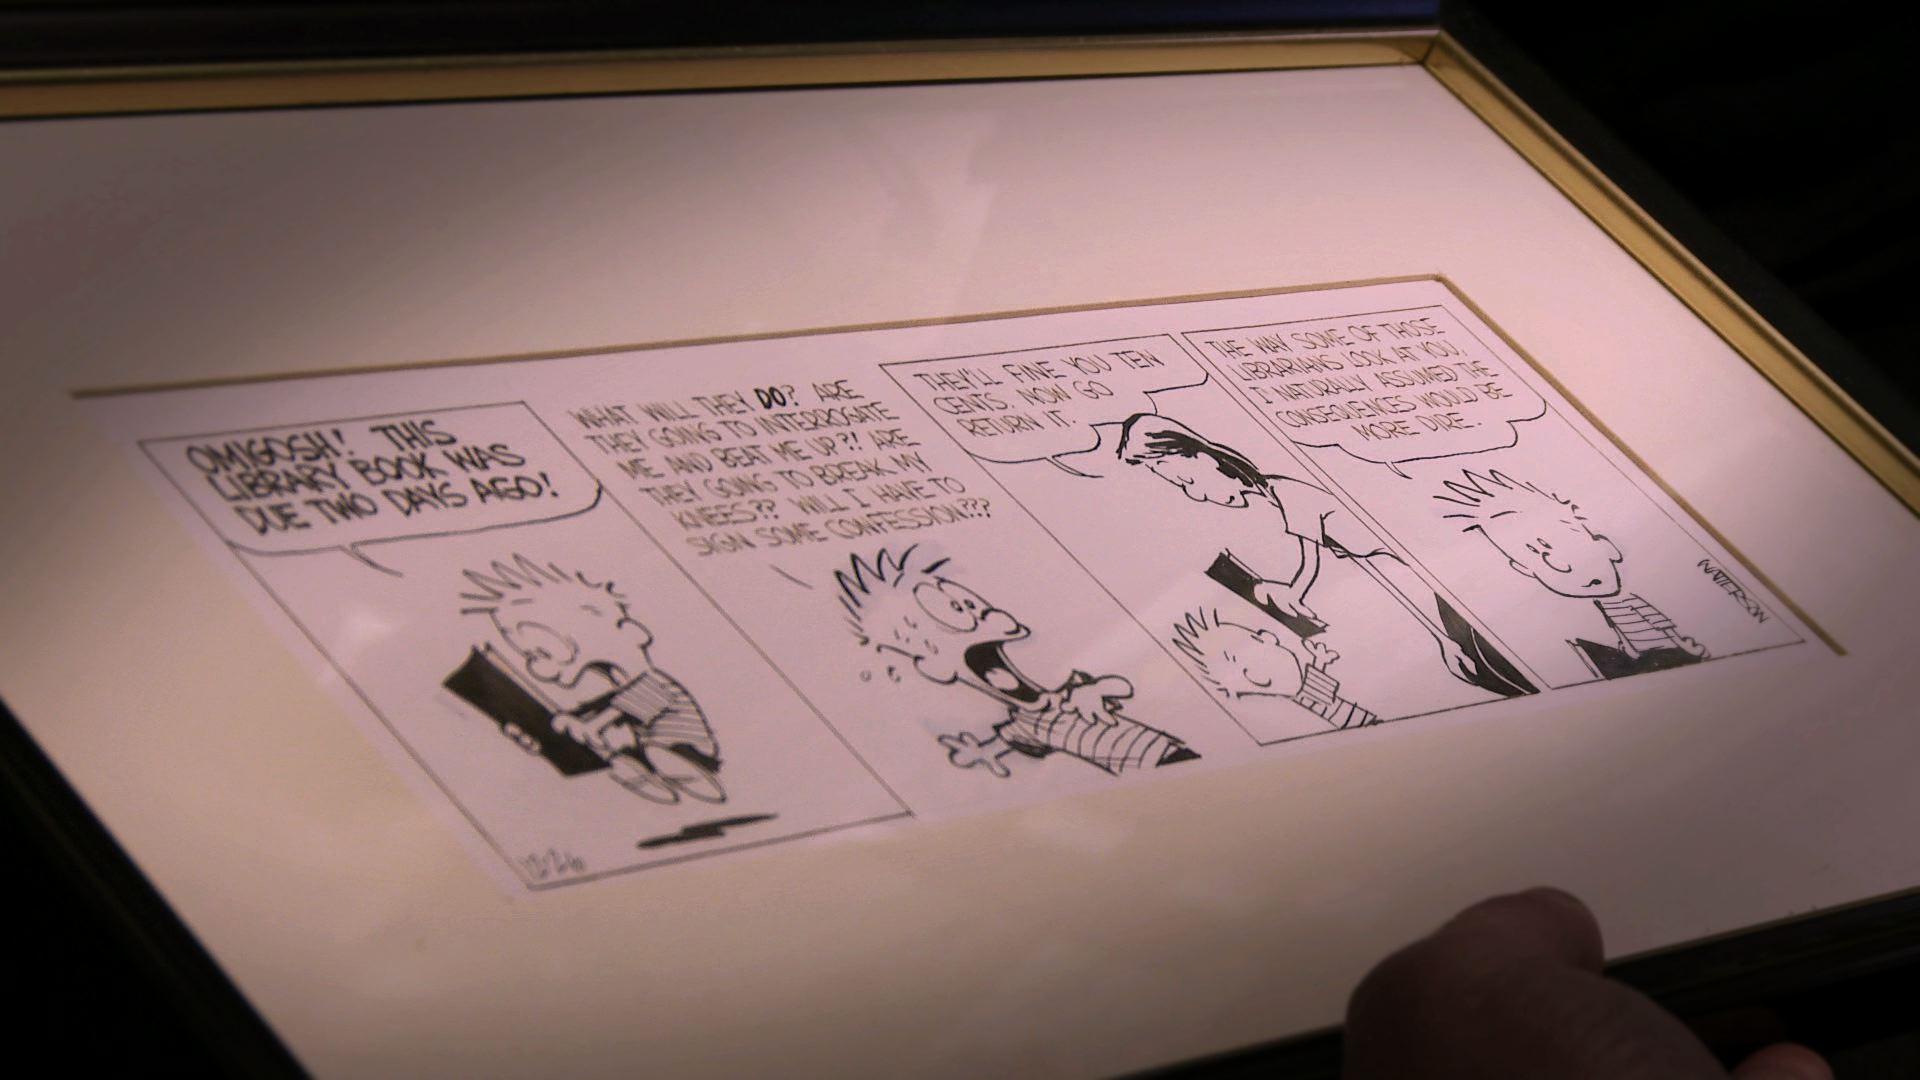 An original Calvin & Hobbes strip